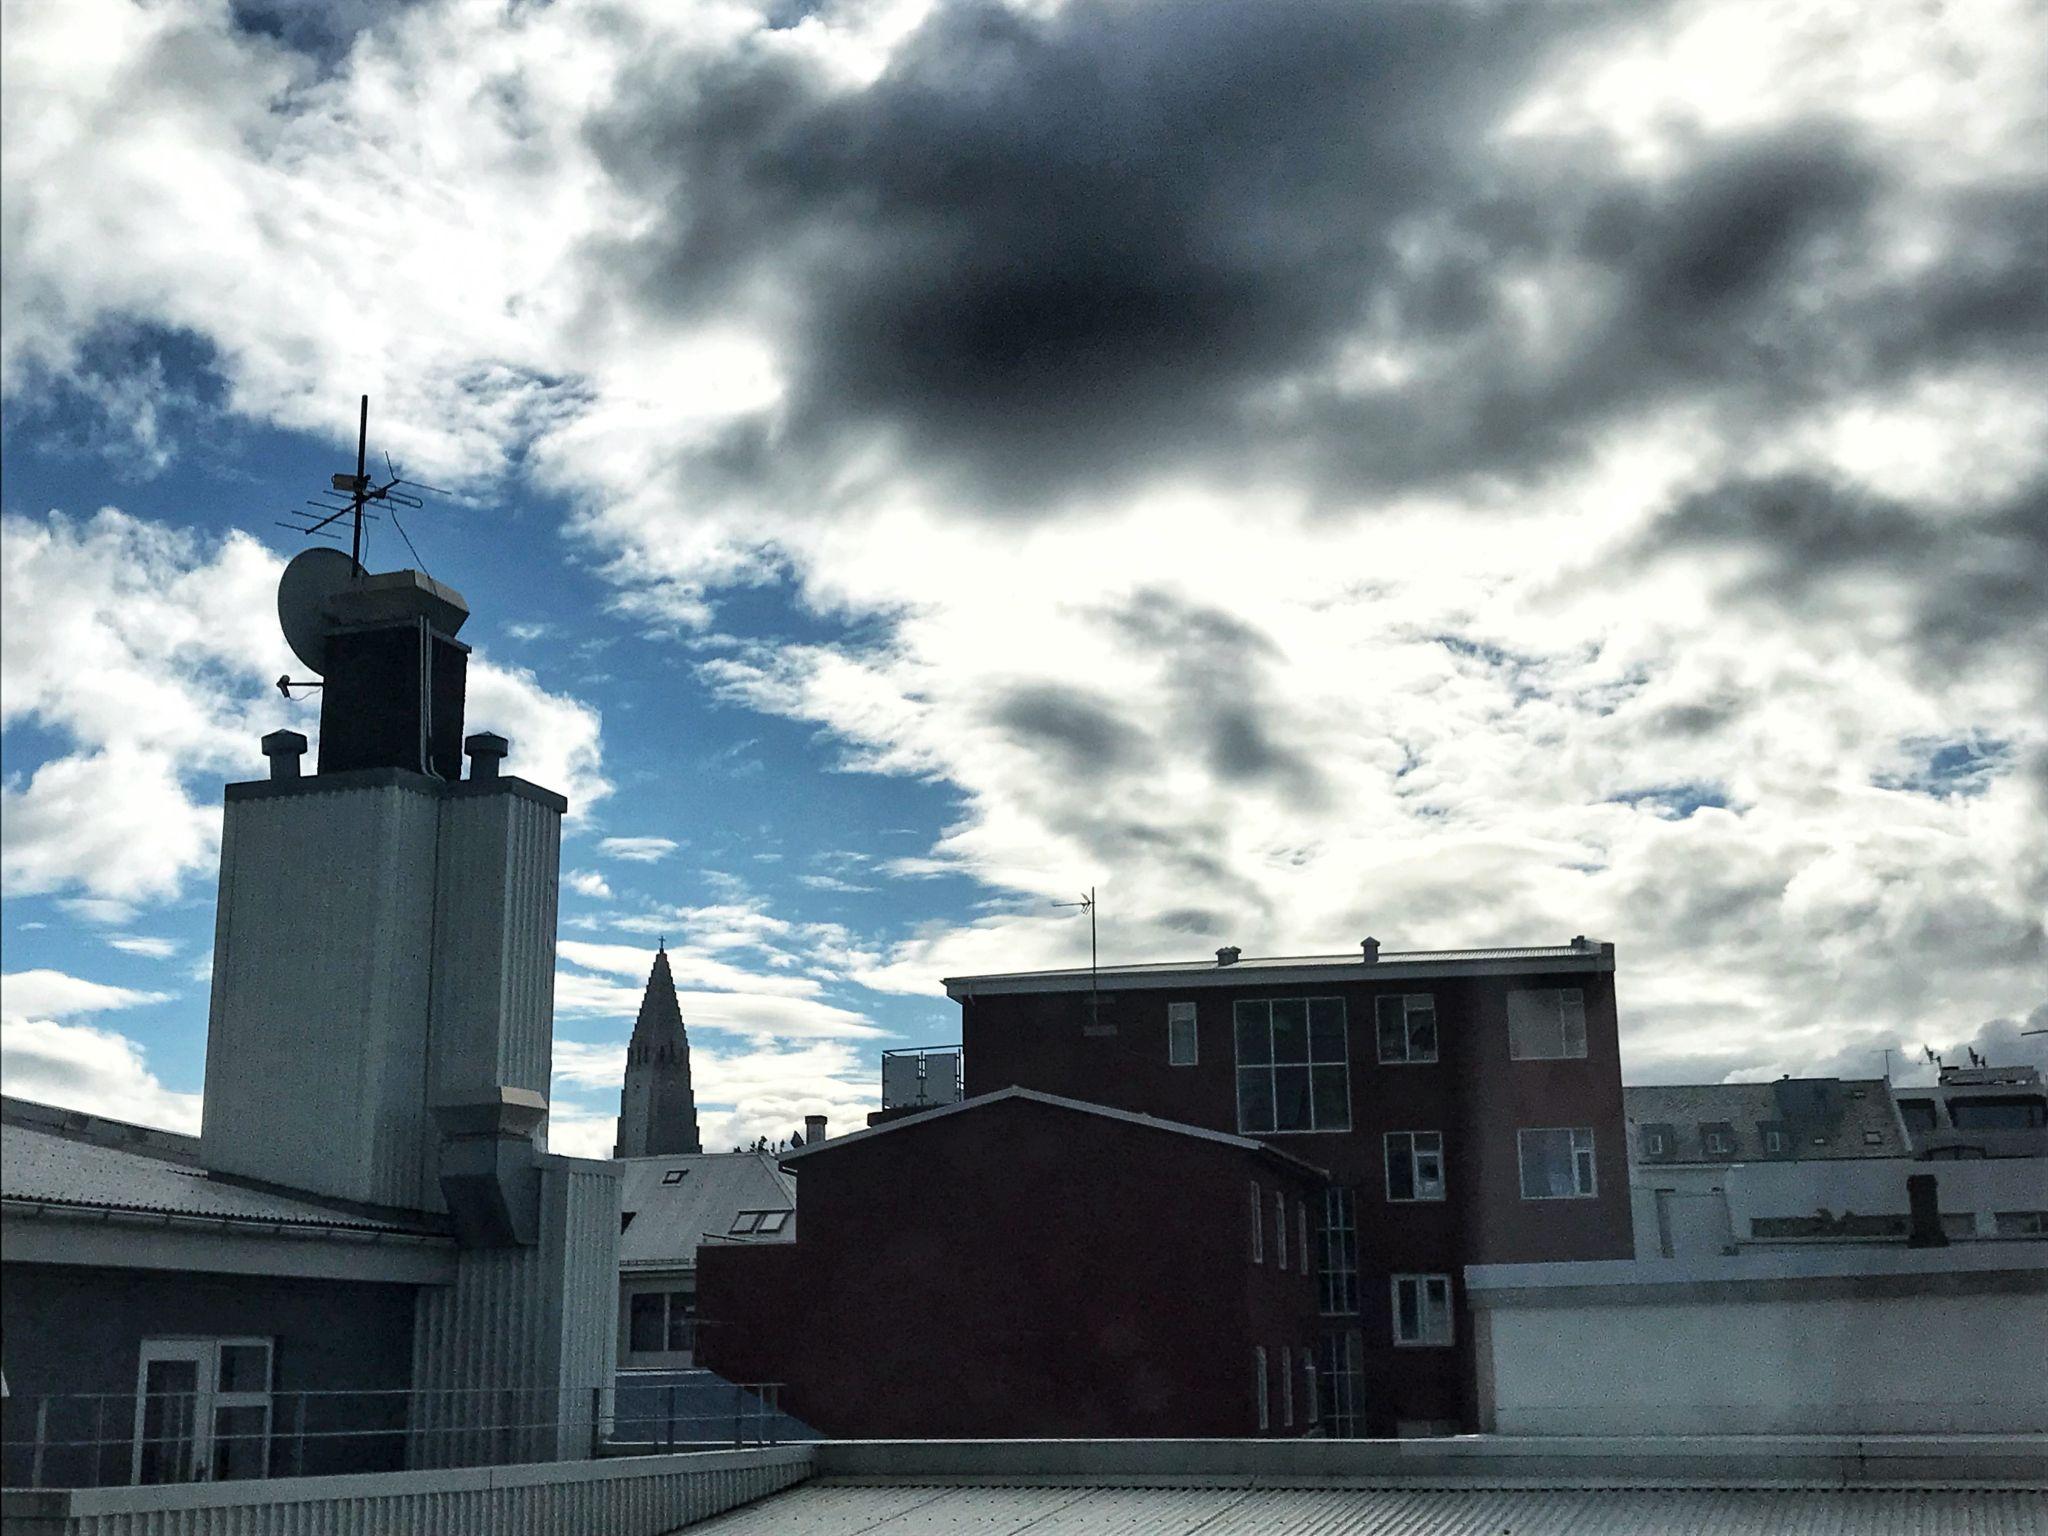 Hotel view of Hallsgrimskirkja Church Reykjavik Iceland